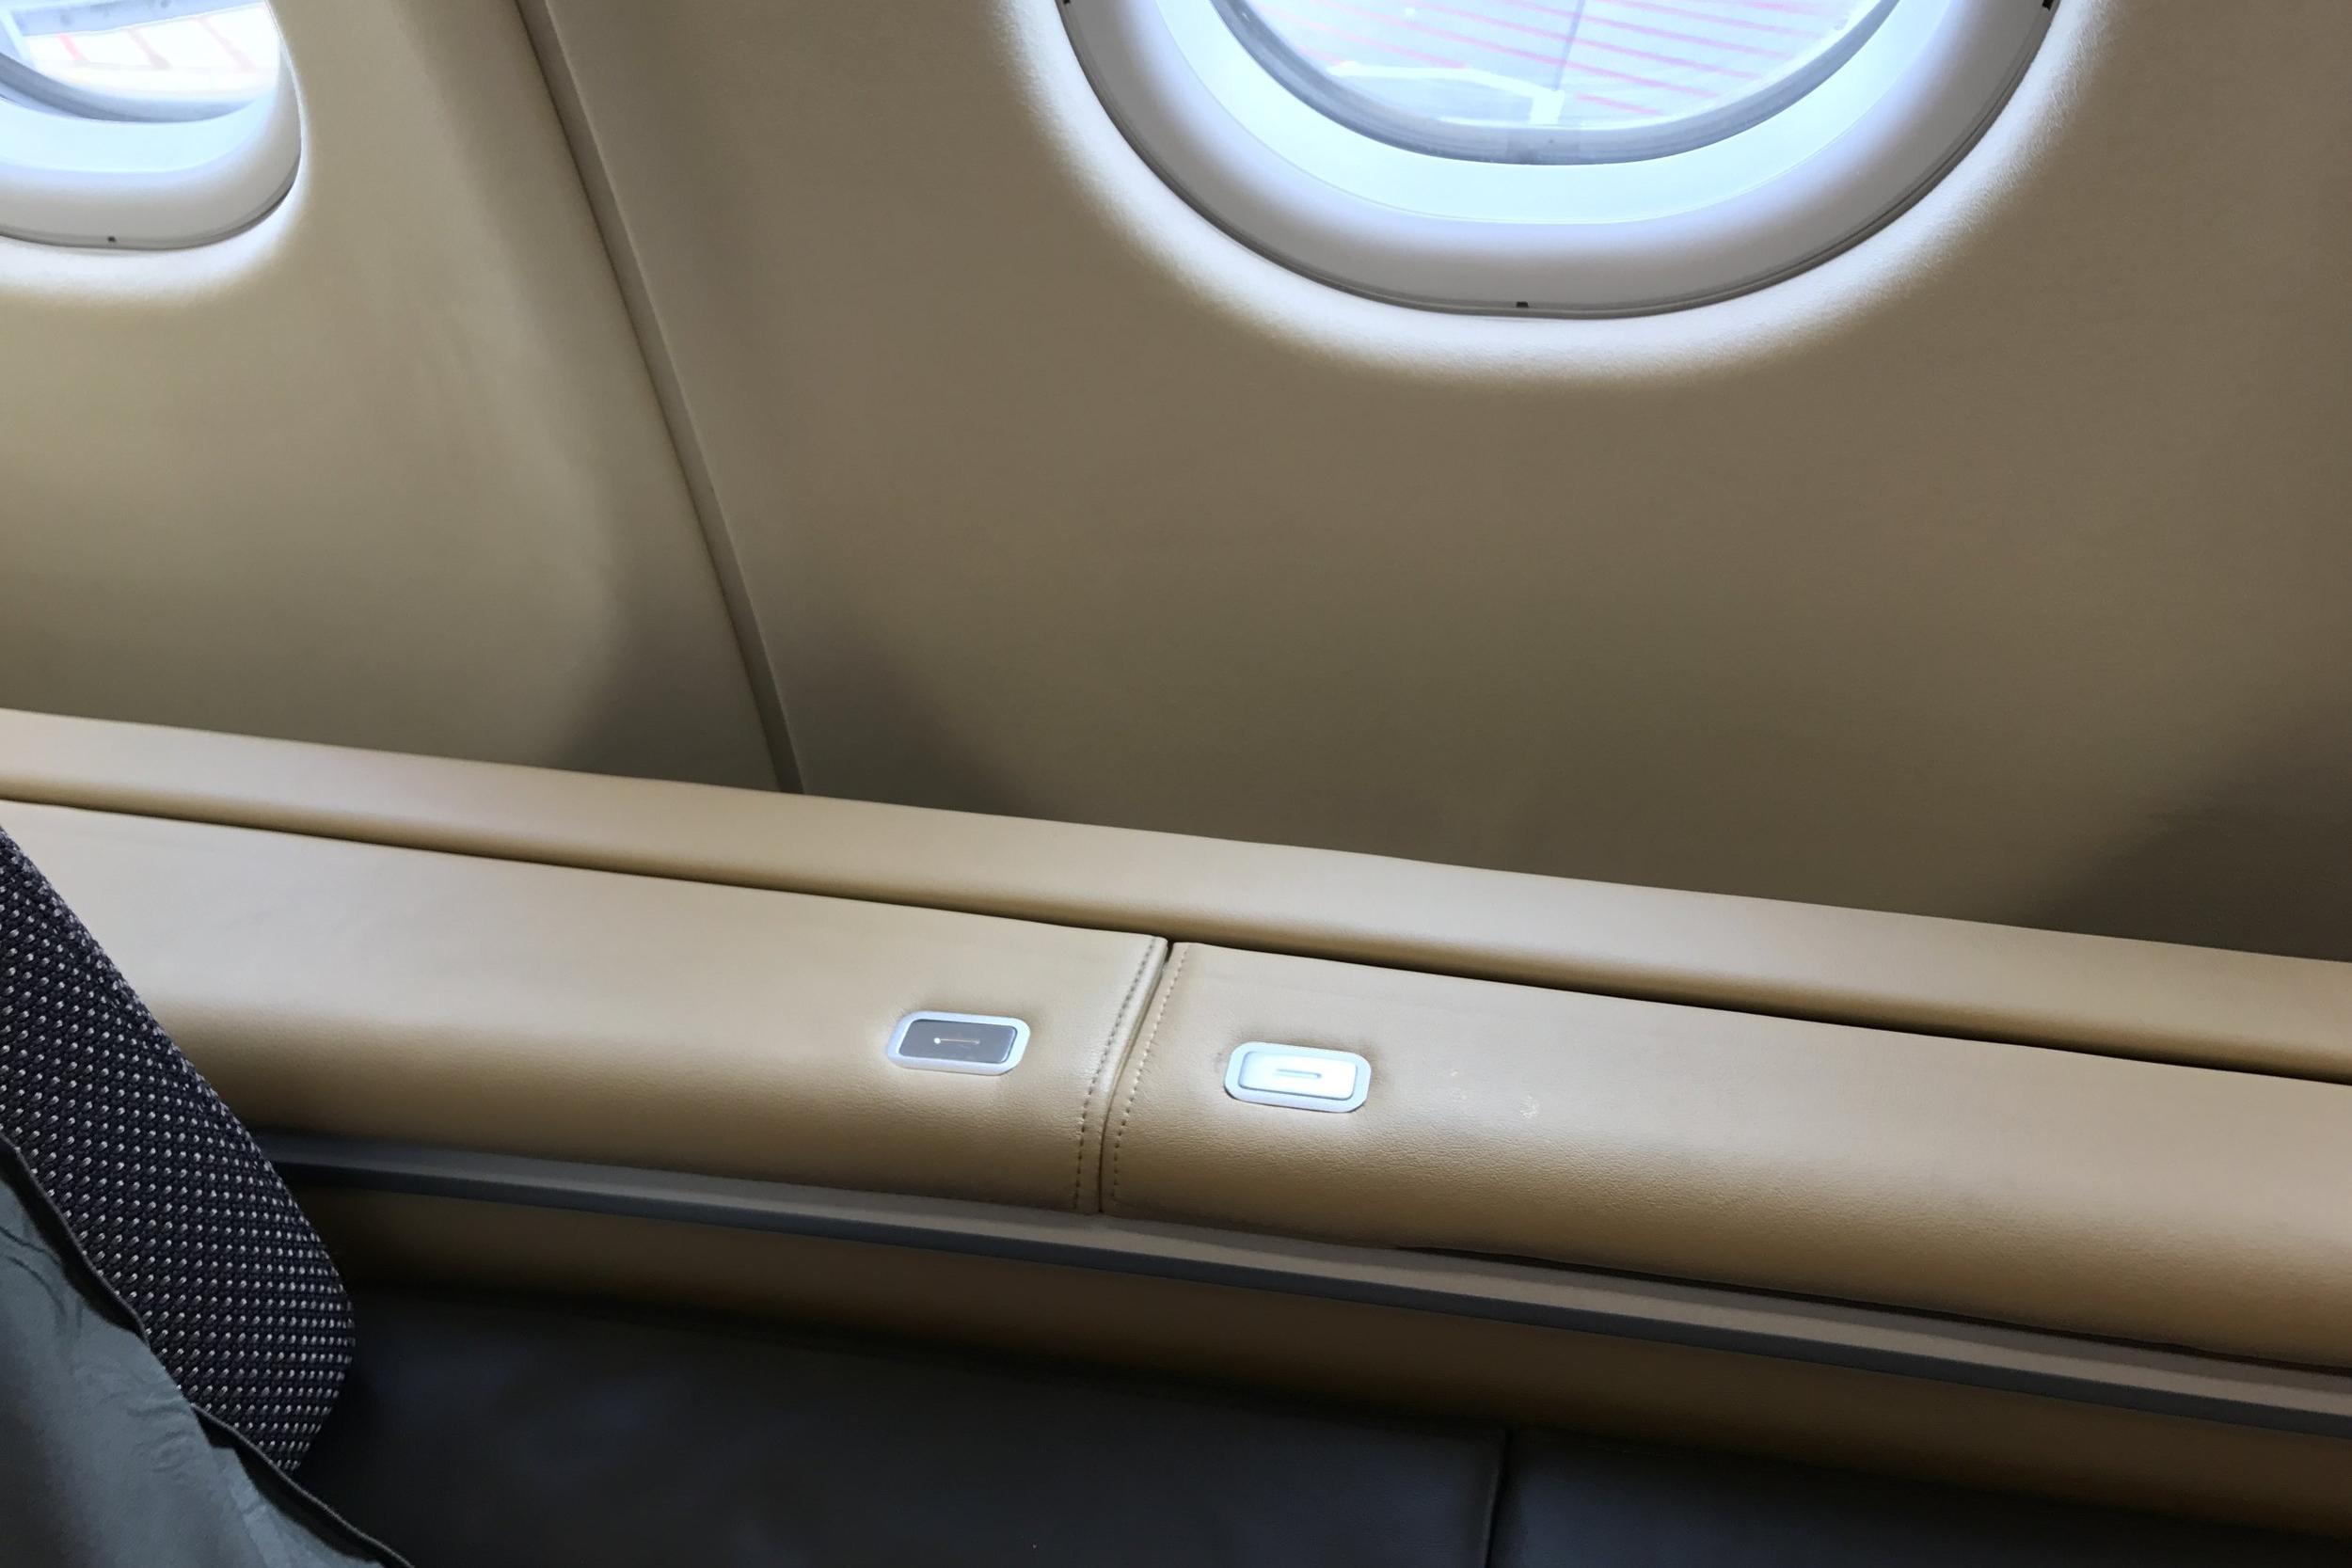 Lufthansa First Class – Storage compartments